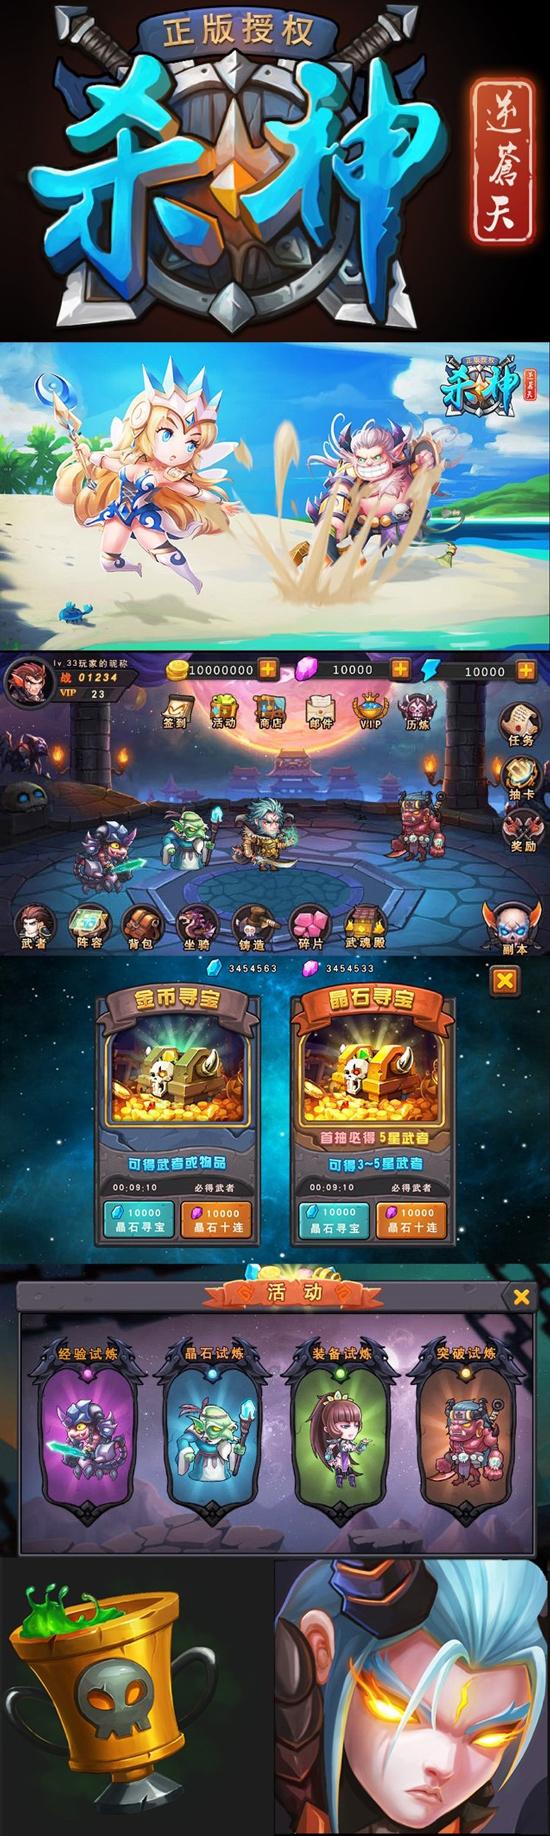 065-game-ui-3